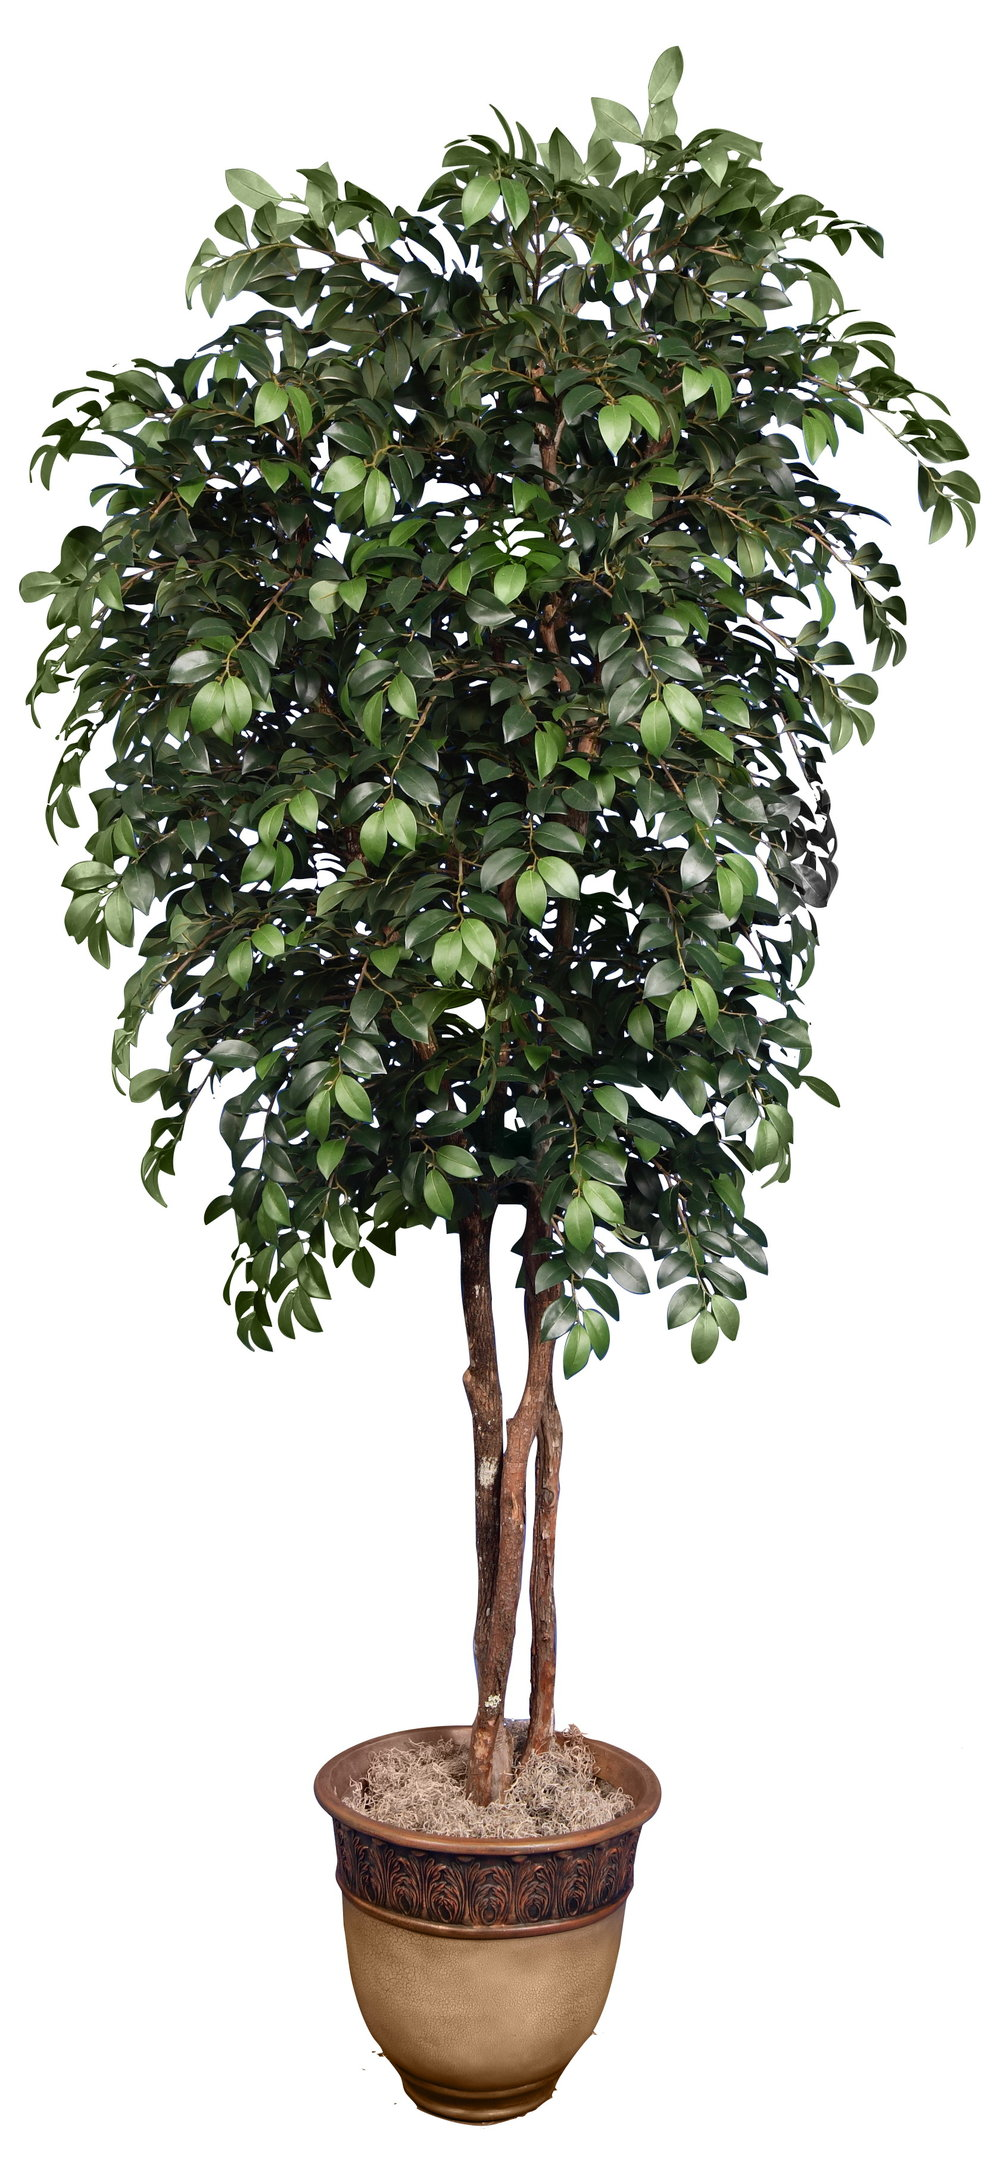 TCM 4111- Sacagi Ficus